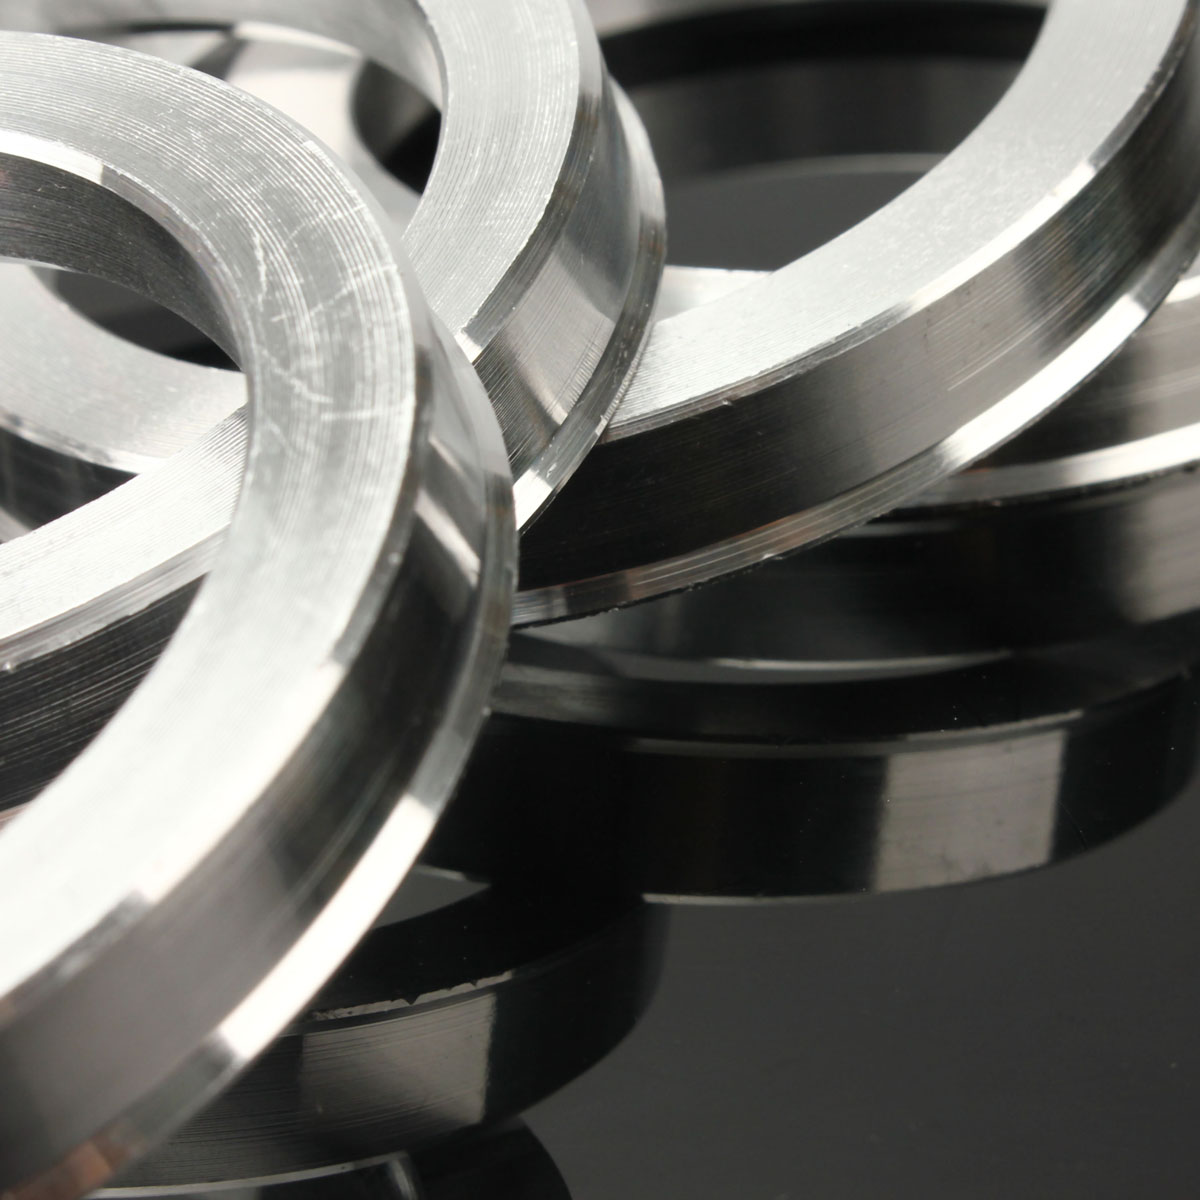 Set of 4x Spigot Rings 72,6-64,1 Car Alloy Wheels Hub centric 72.6-64.1 H 6 mm